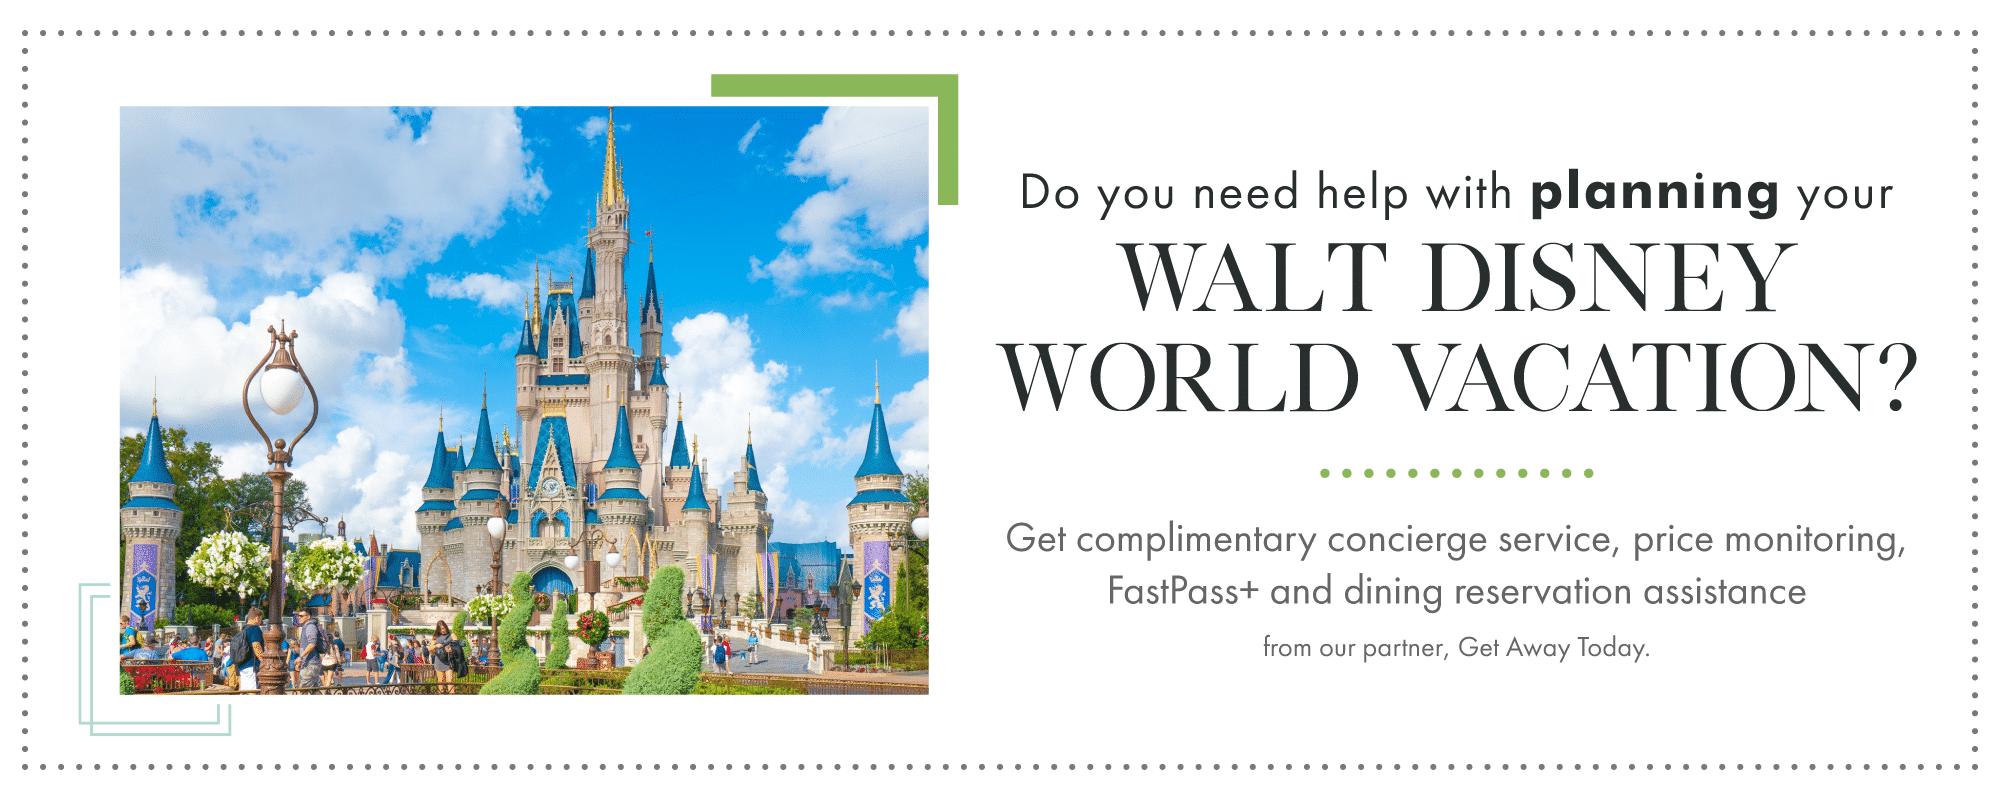 Get help planning your Walt Disney World Vacation.